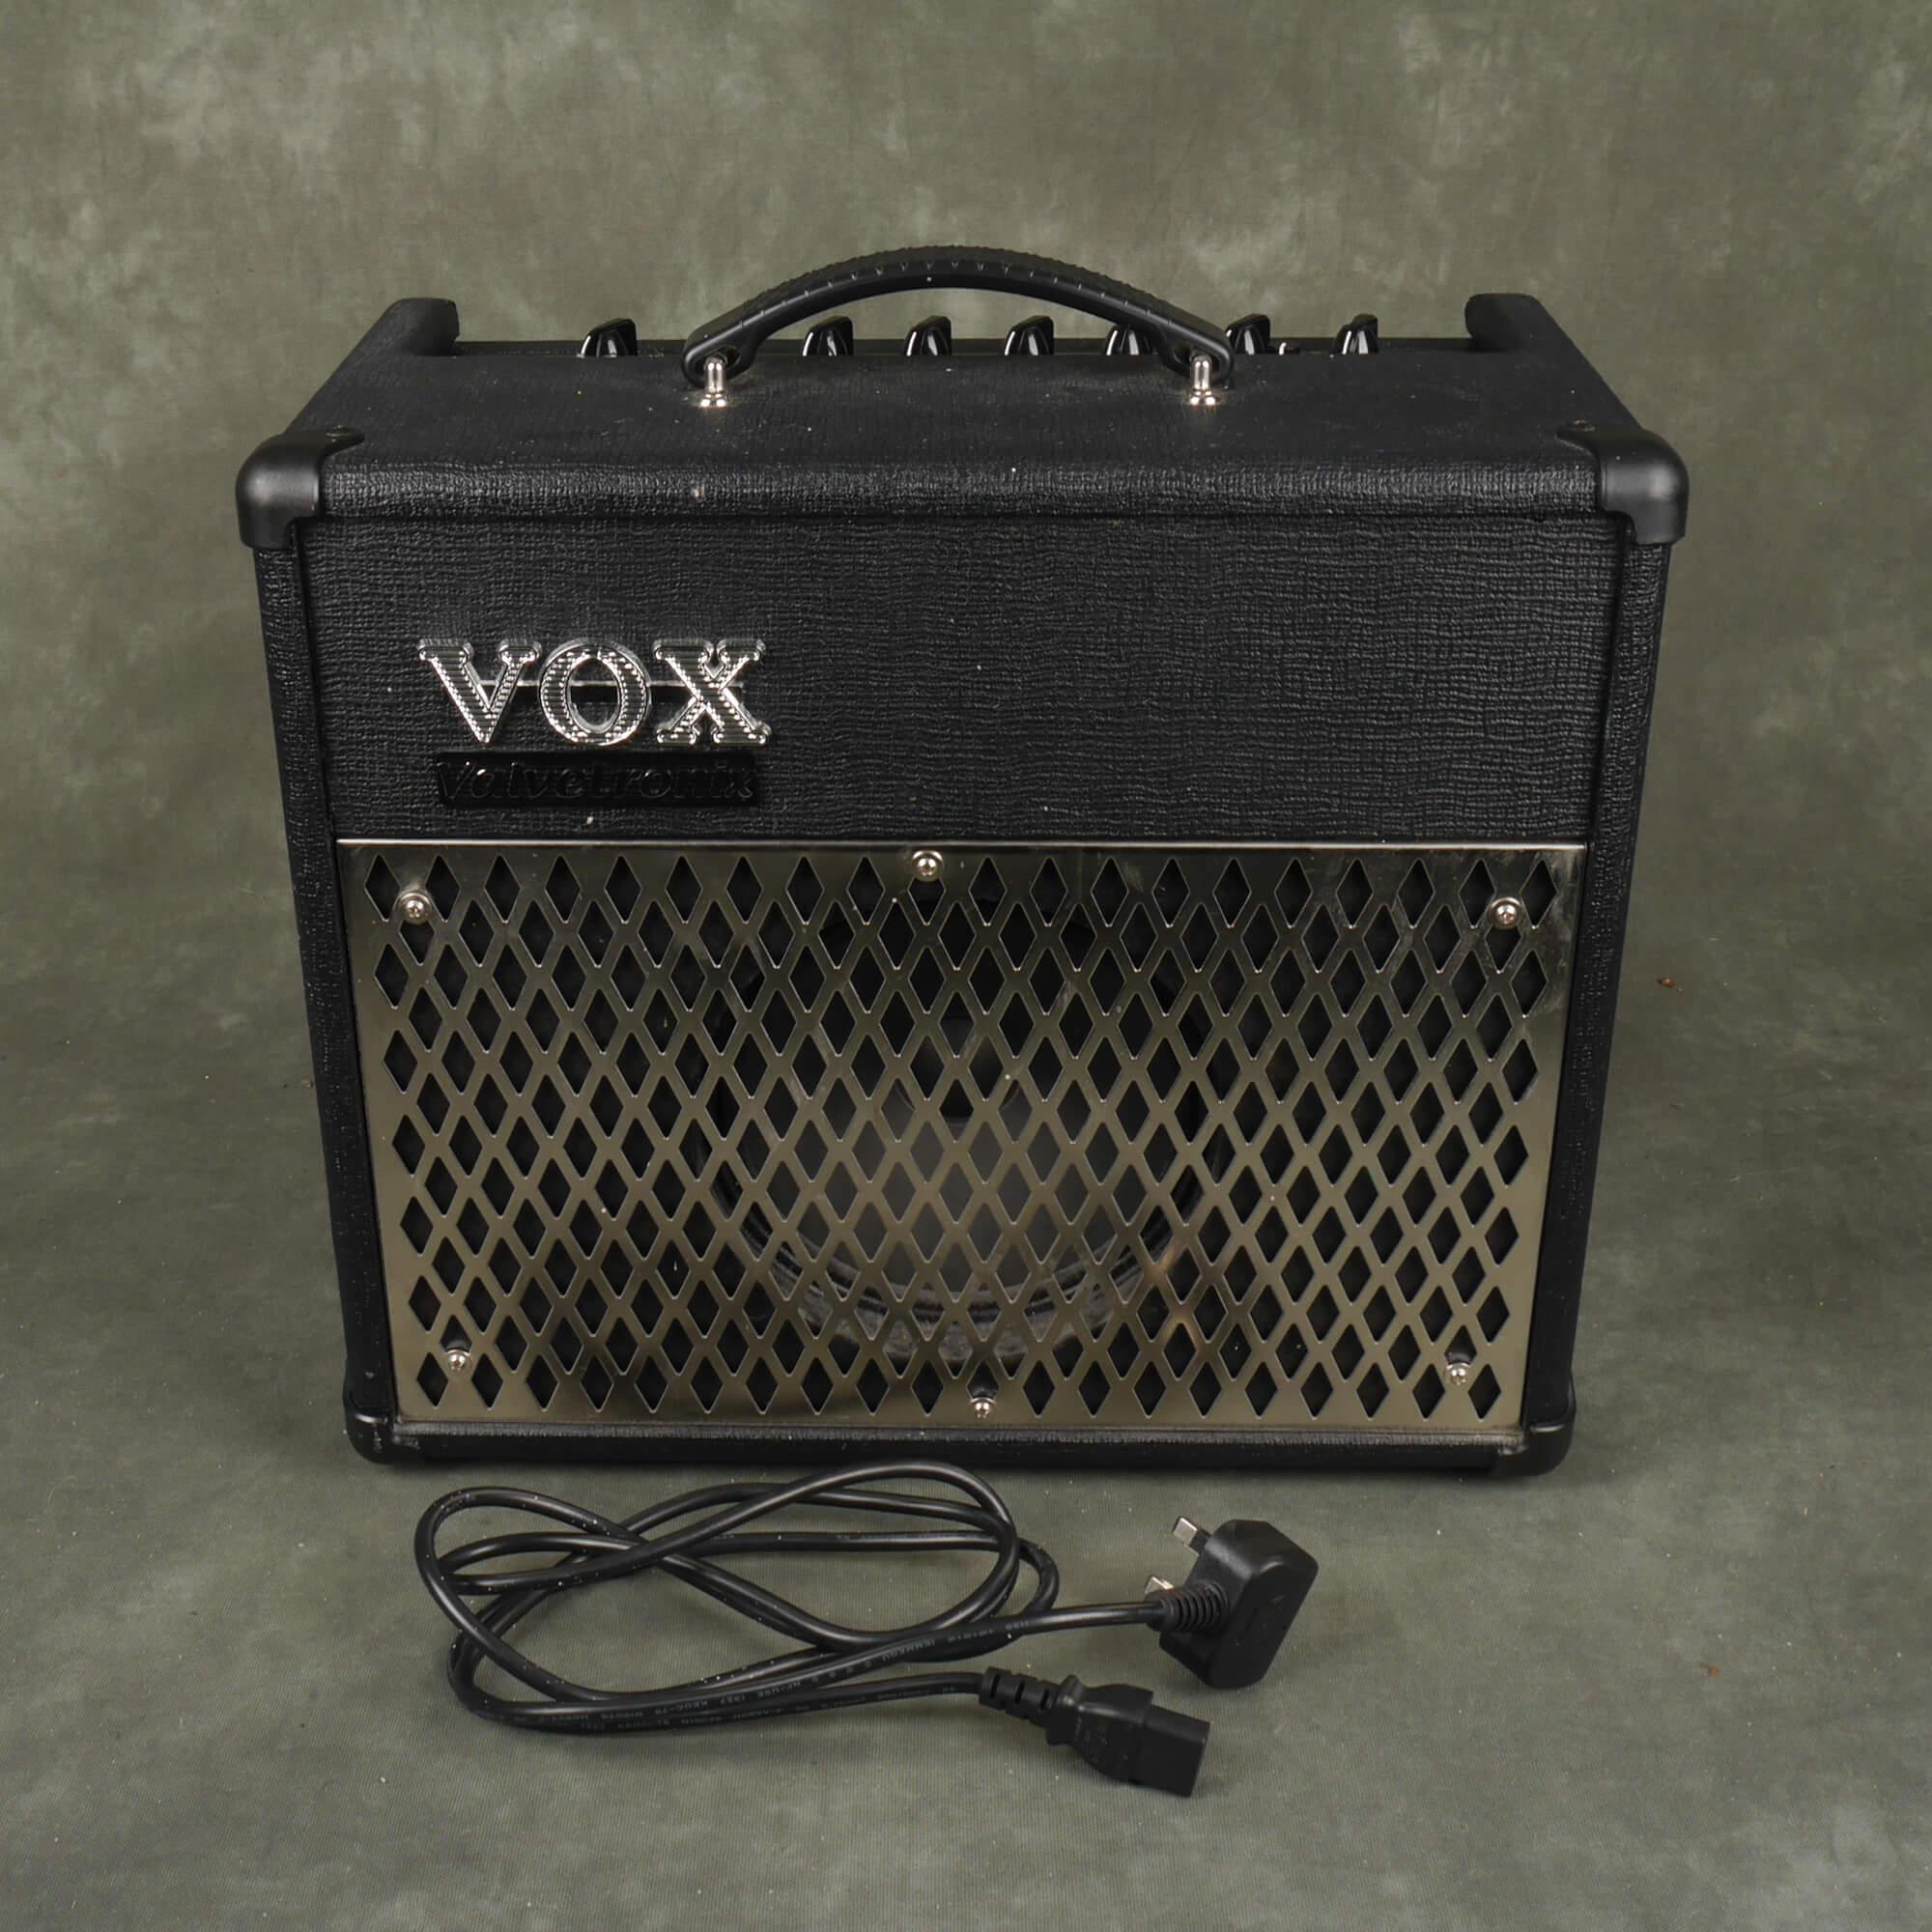 Vox AD15VT Valvetronix Guitar Amplifier - 2nd Hand